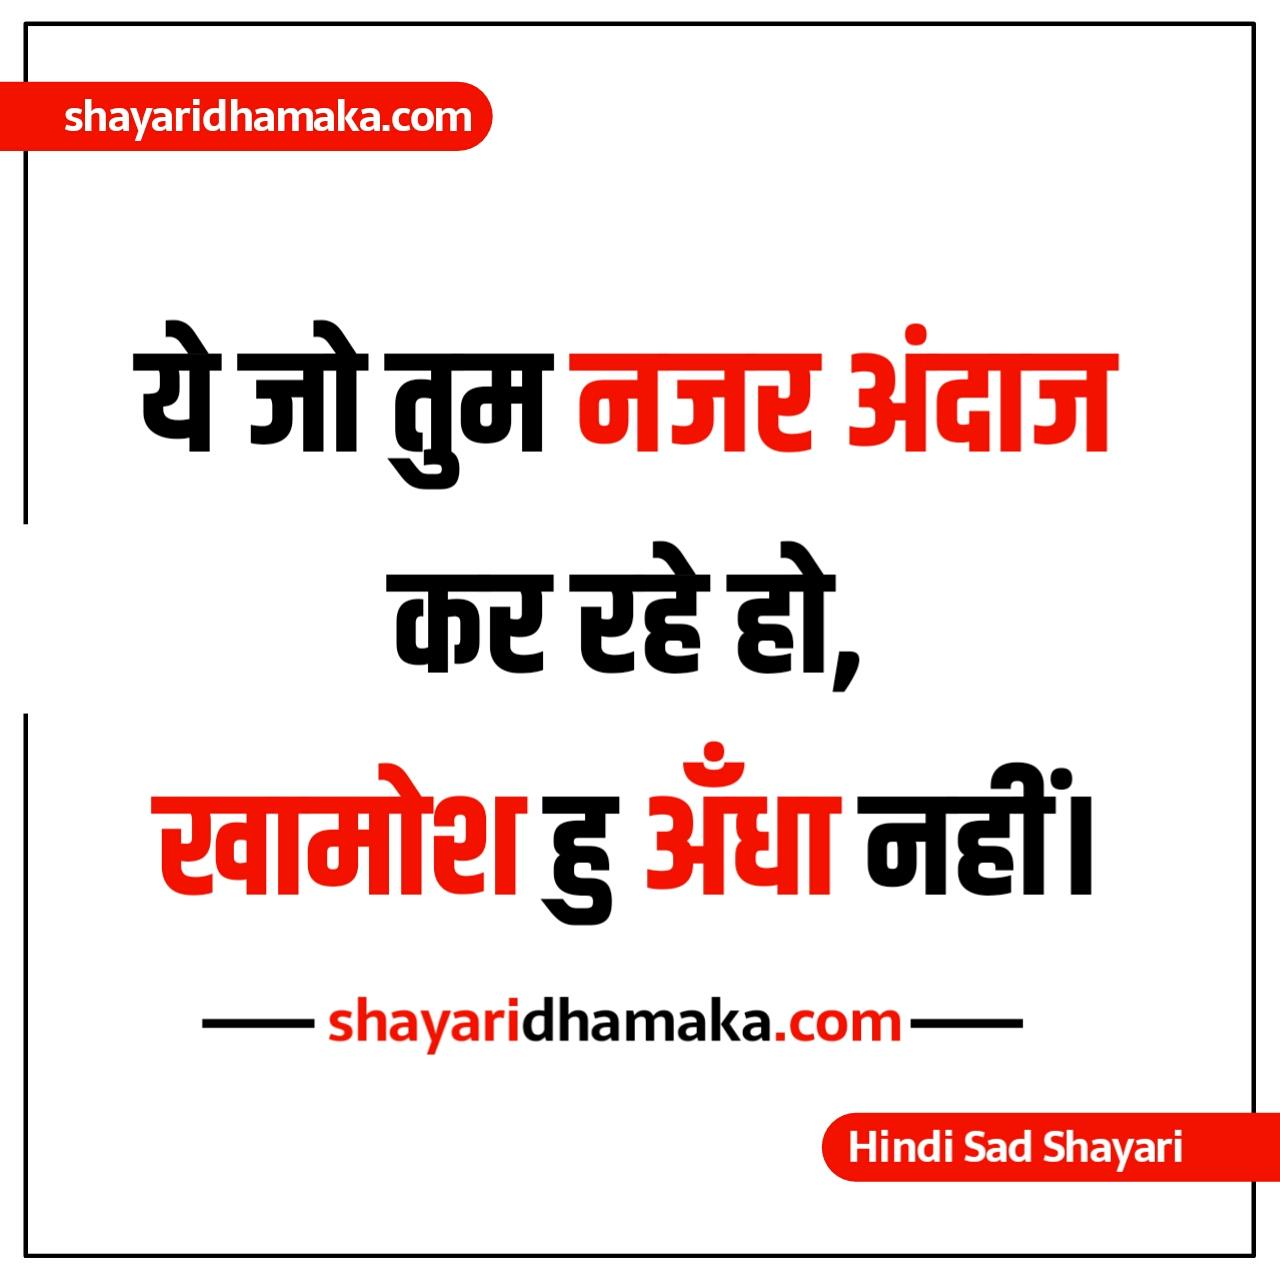 ये जो तुम नजर अंदाज कर रहे हो - Hindi Sad Shayari